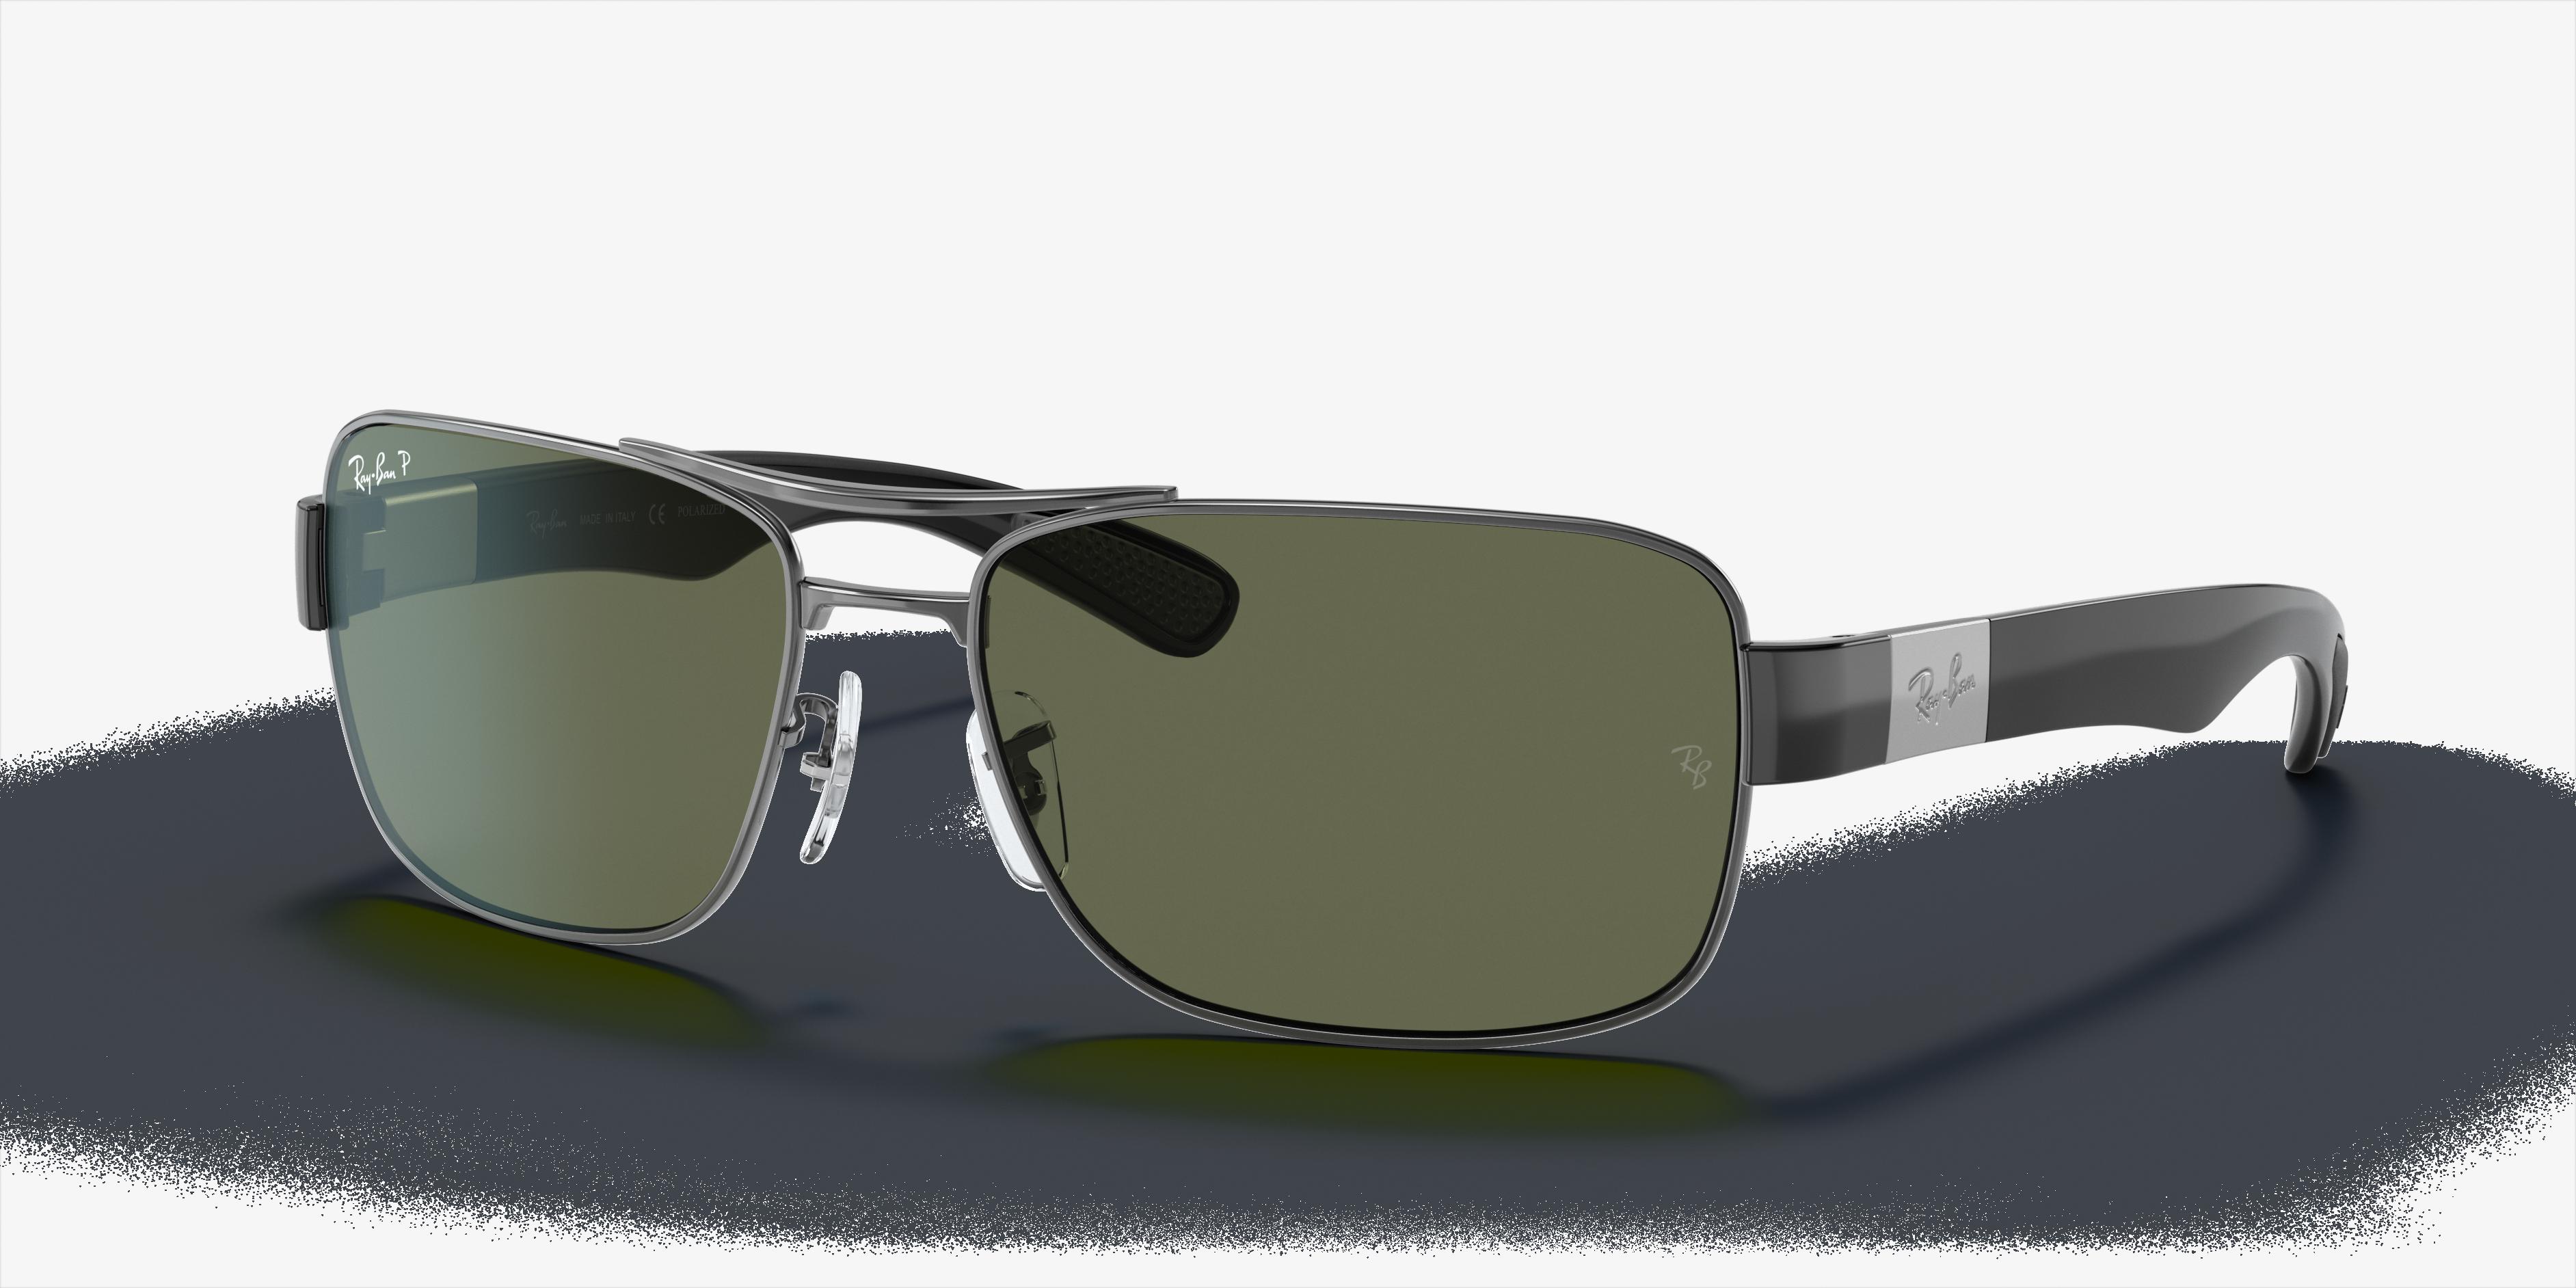 Ray-Ban Rb3522 Gunmetal, Polarized Green Lenses - RB3522